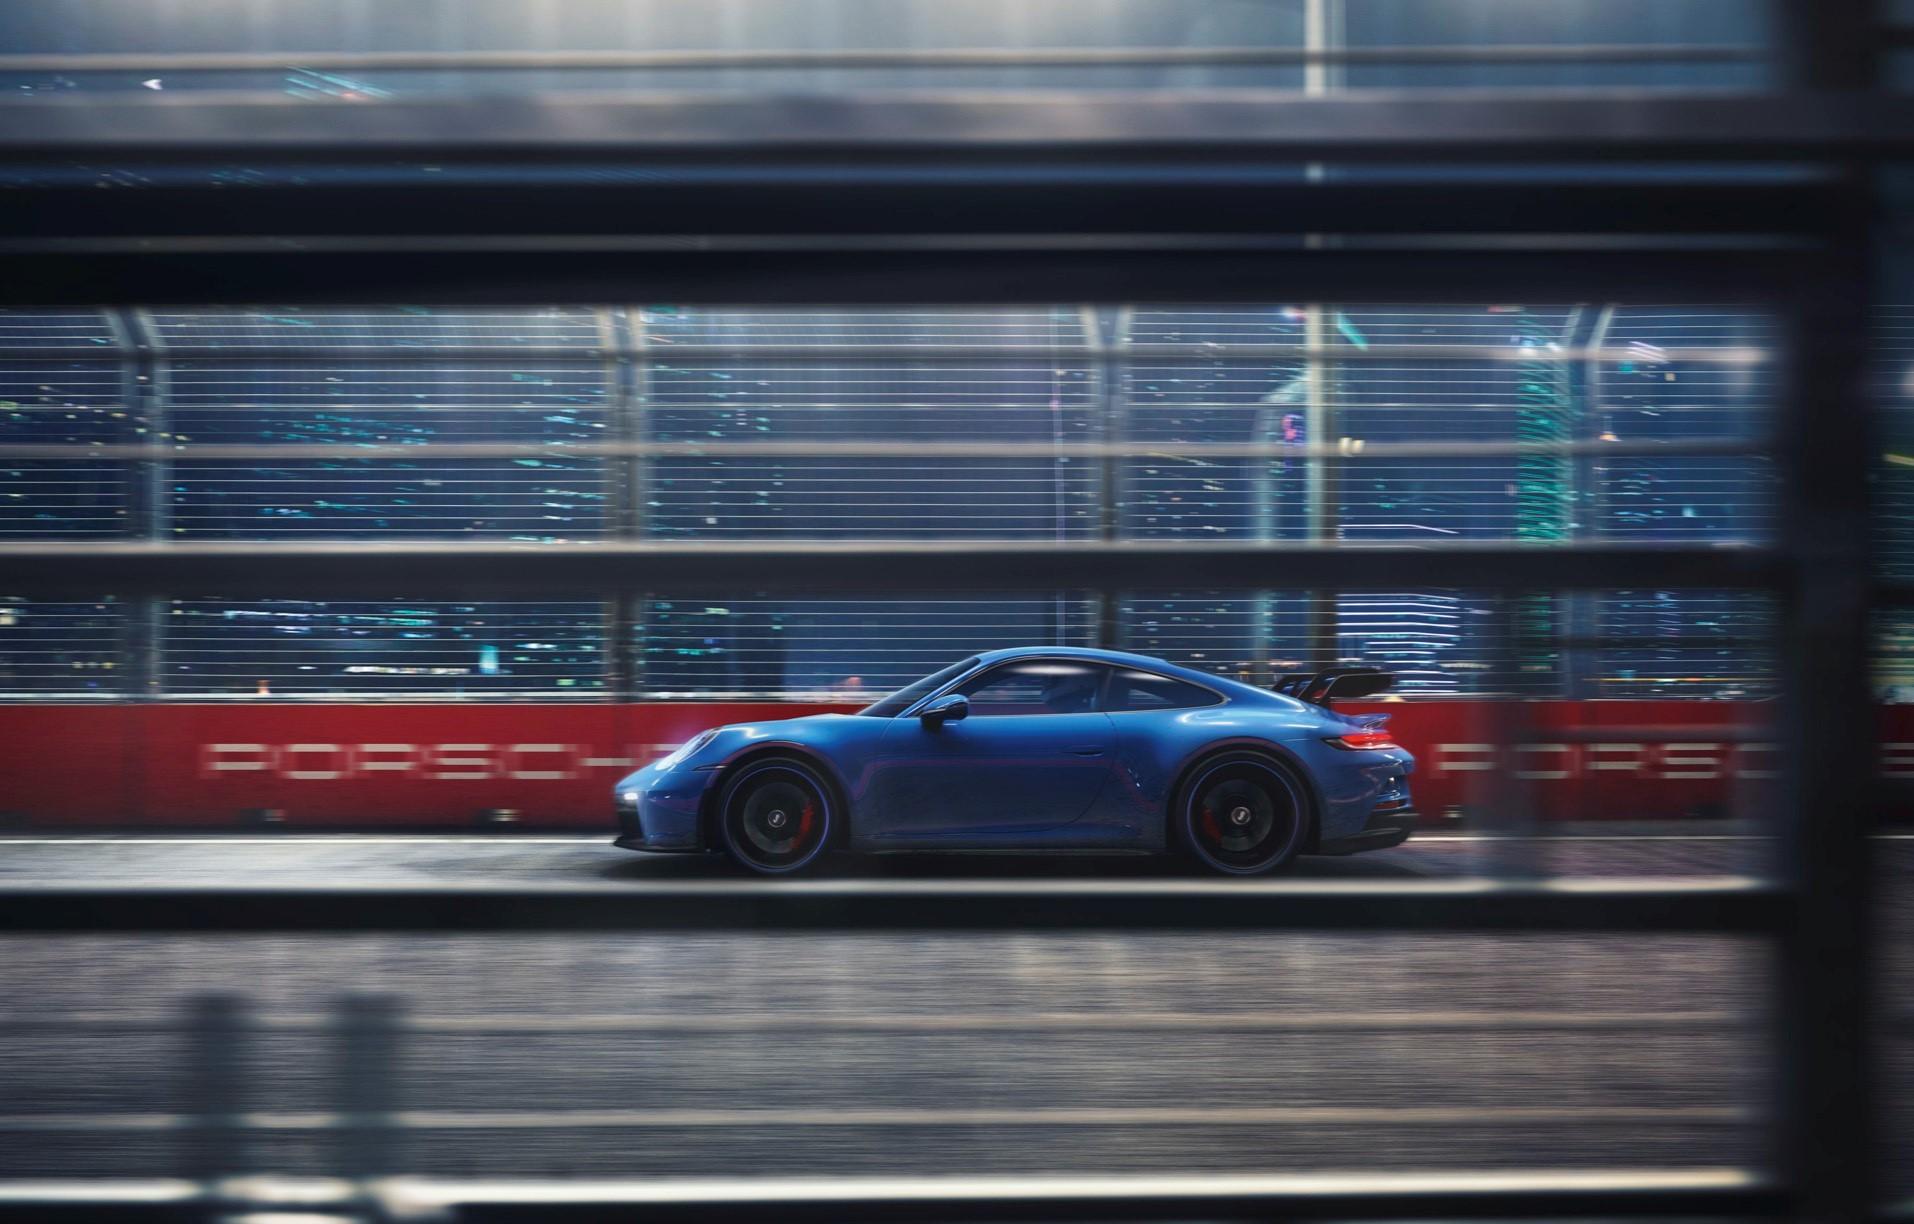 Porsche 911 Gt3 Combustion Engine Efuel Side